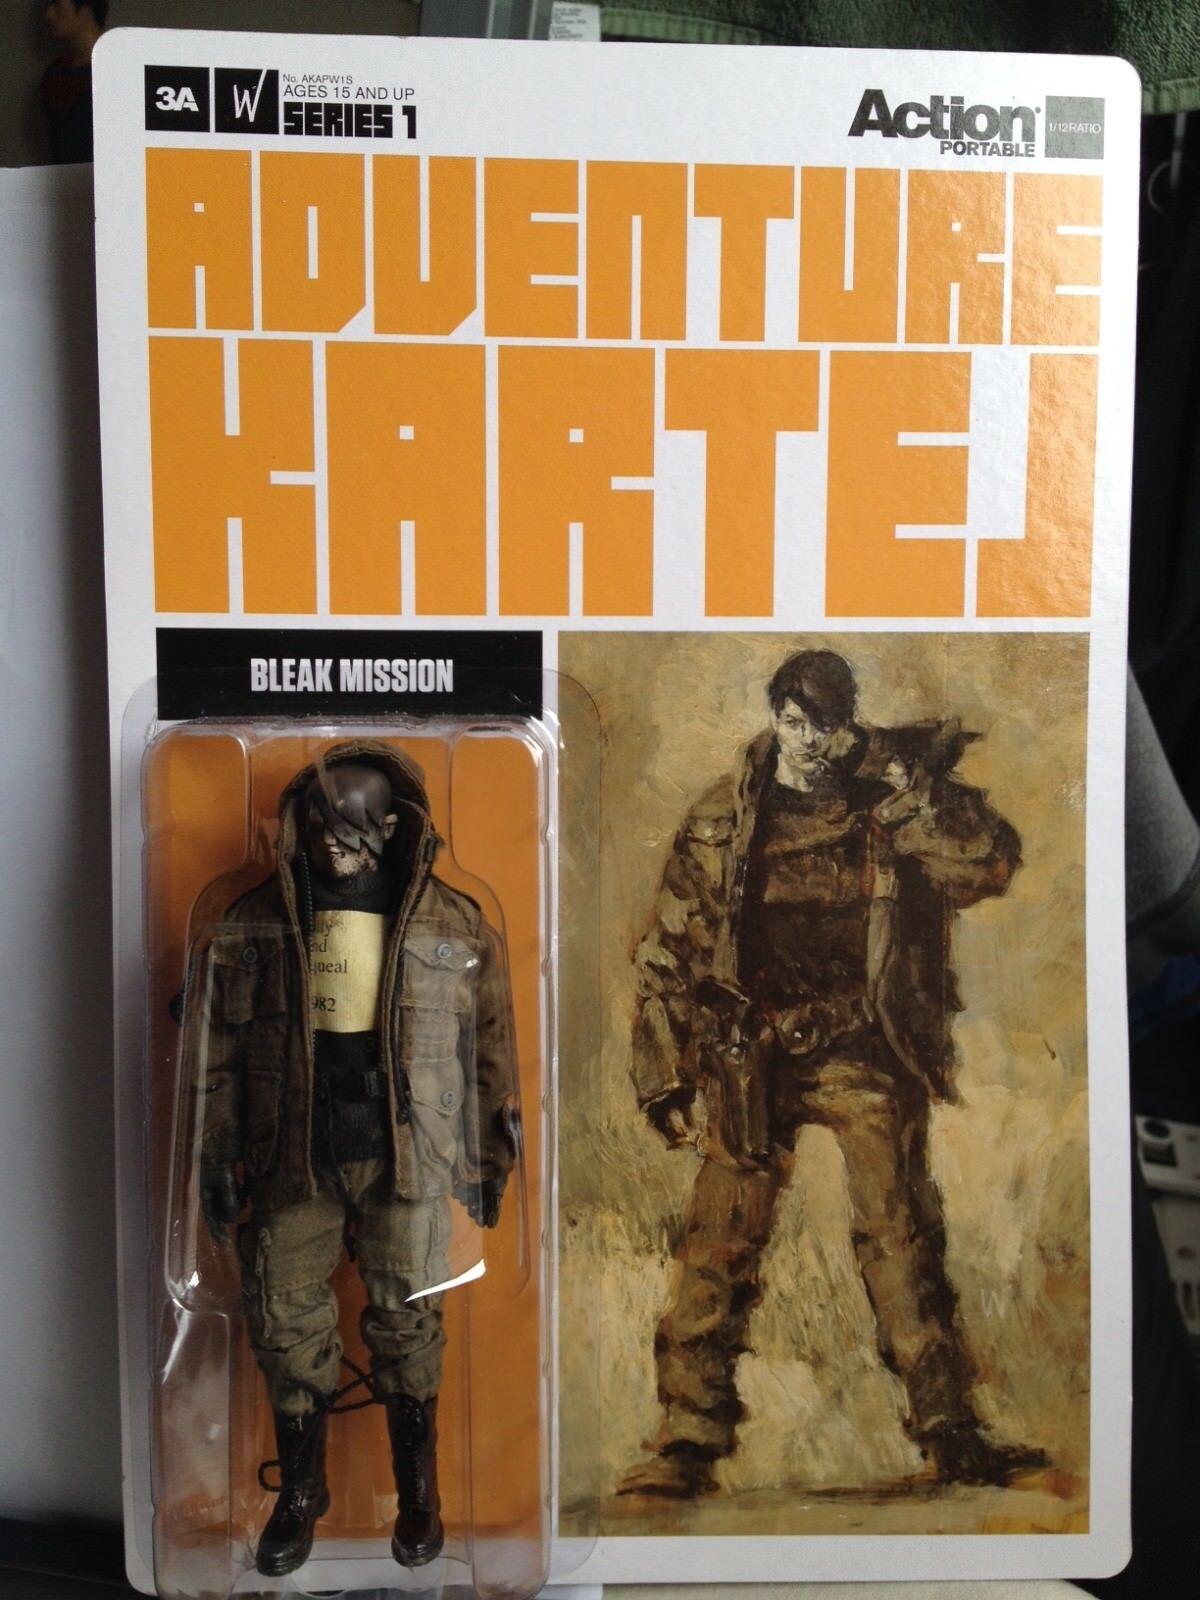 3A ThreeA Ashley Wood Action Portable Bleak Mission Adventure Kartel 1/12 scale